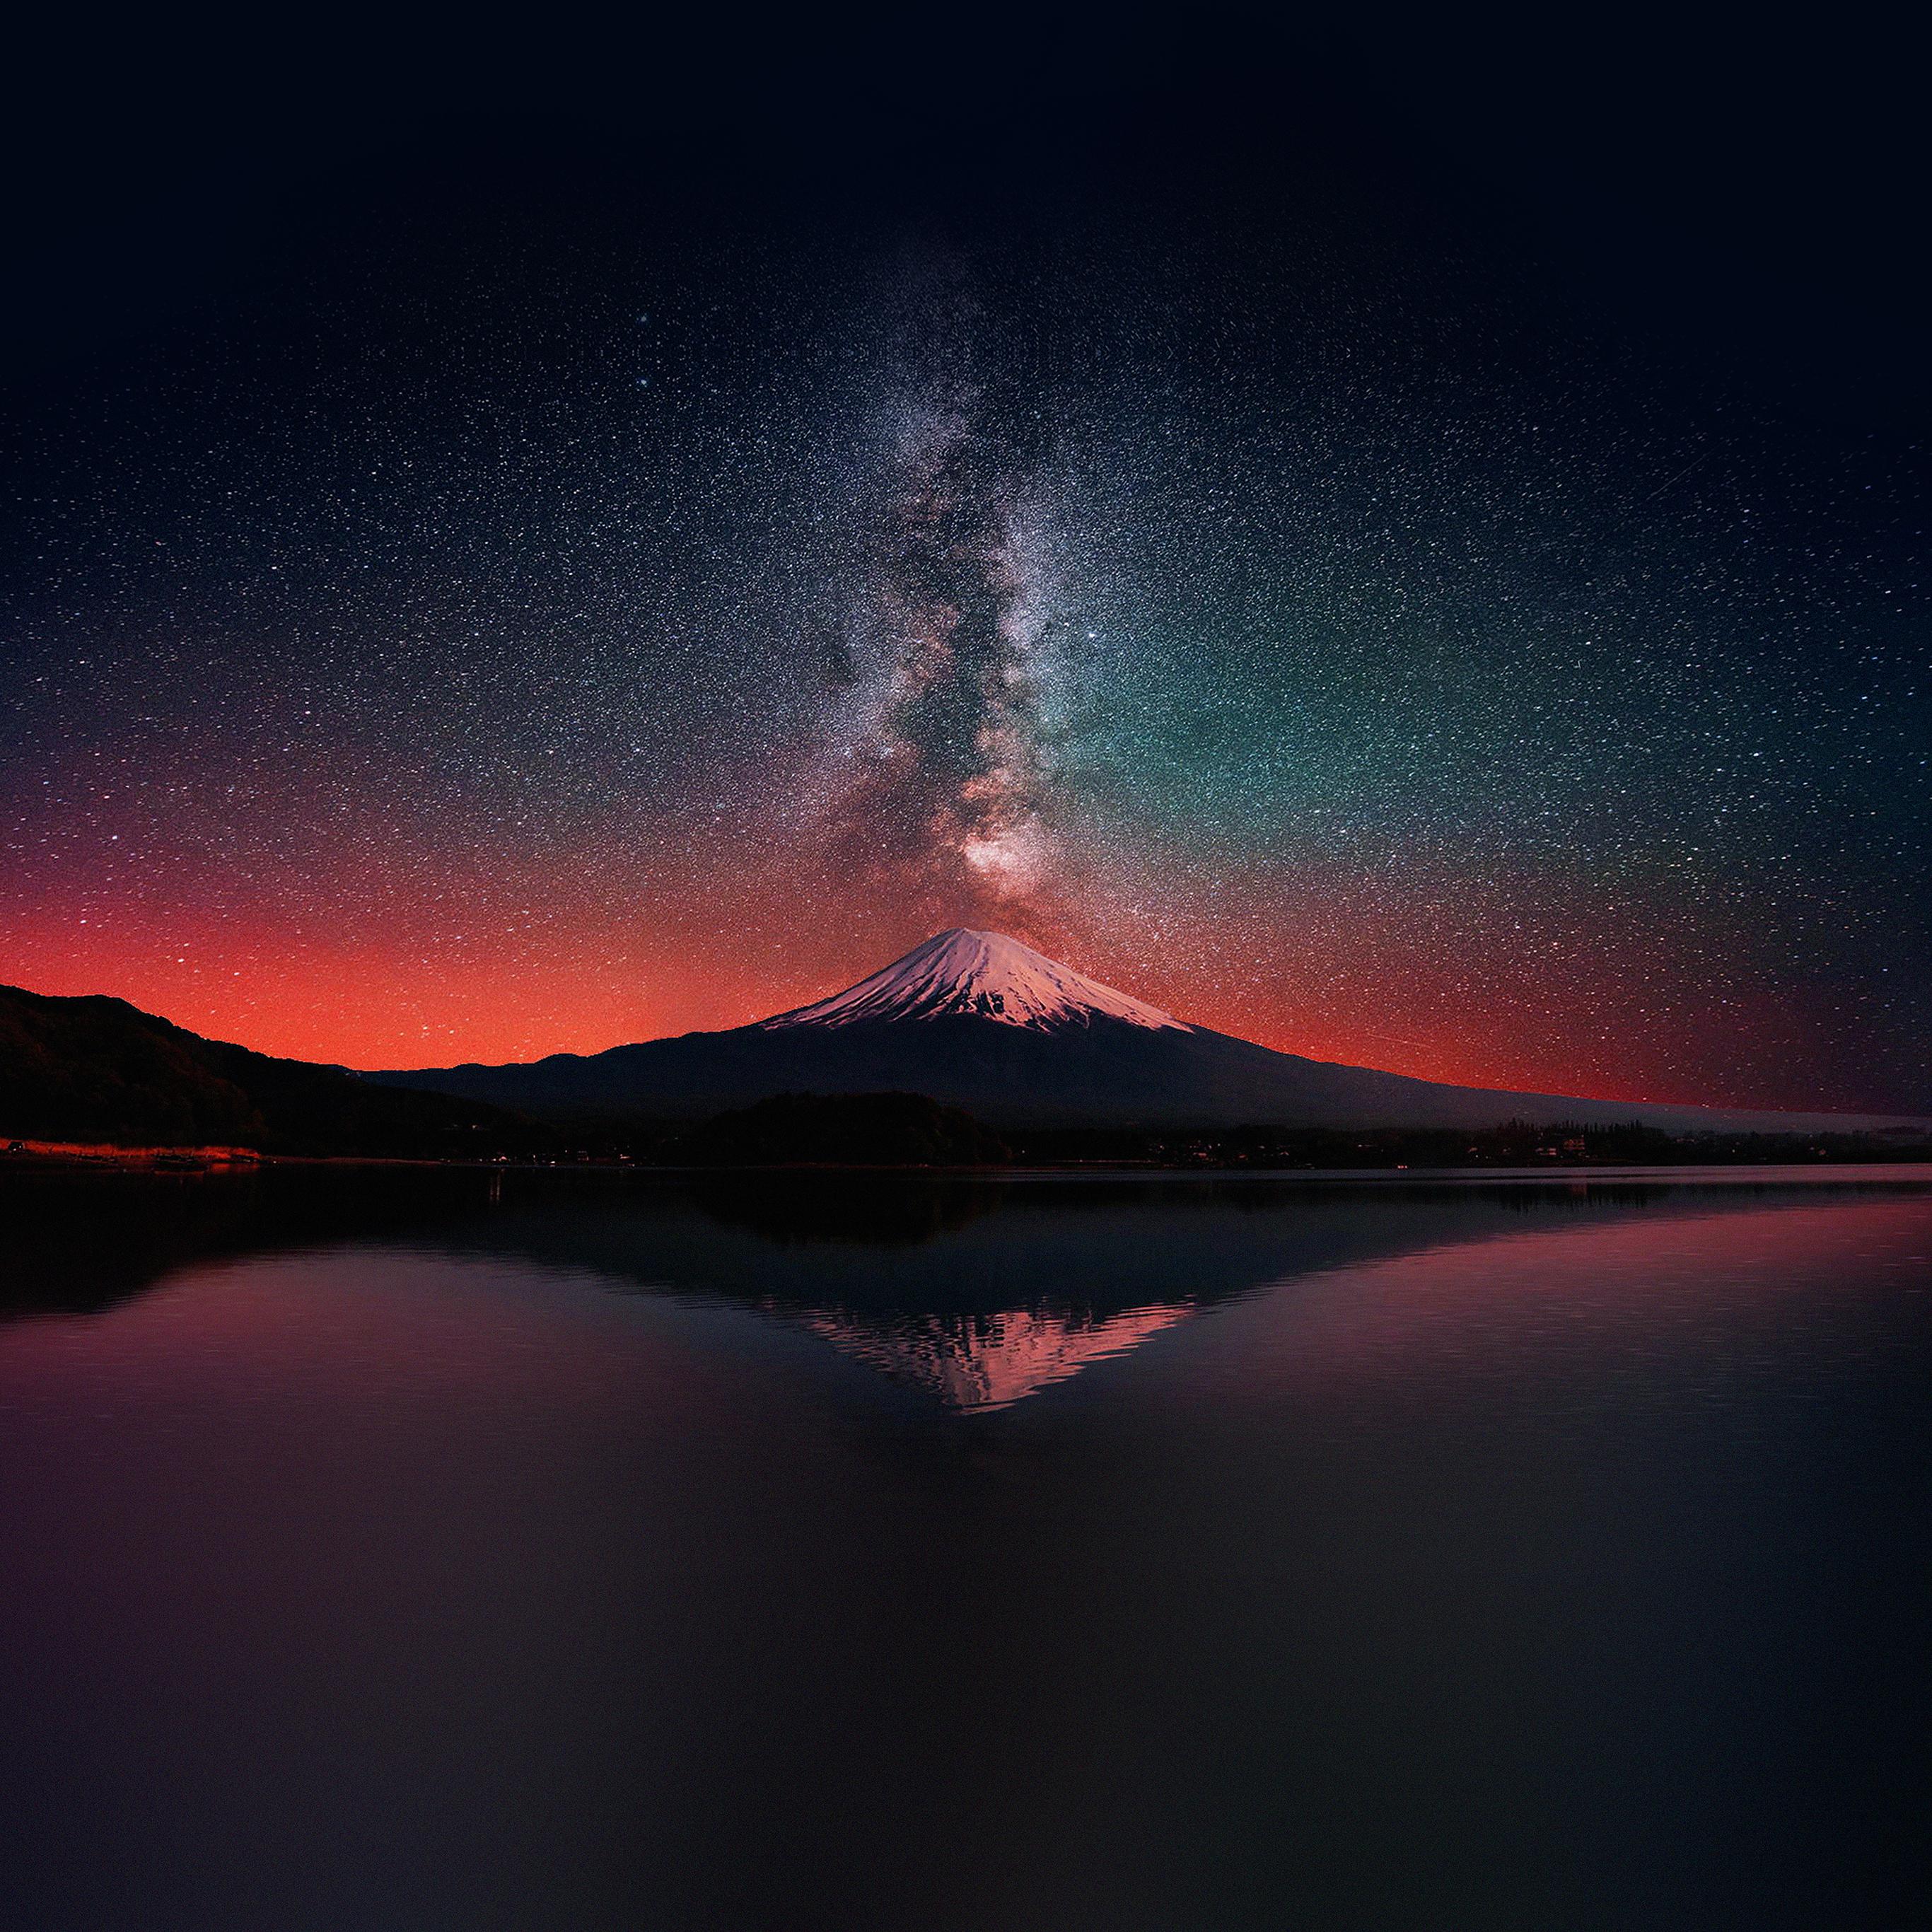 Milky Way Wallpaper: Mc69-wallpaper-milky-way-on-dark-mountain-fuji-sky